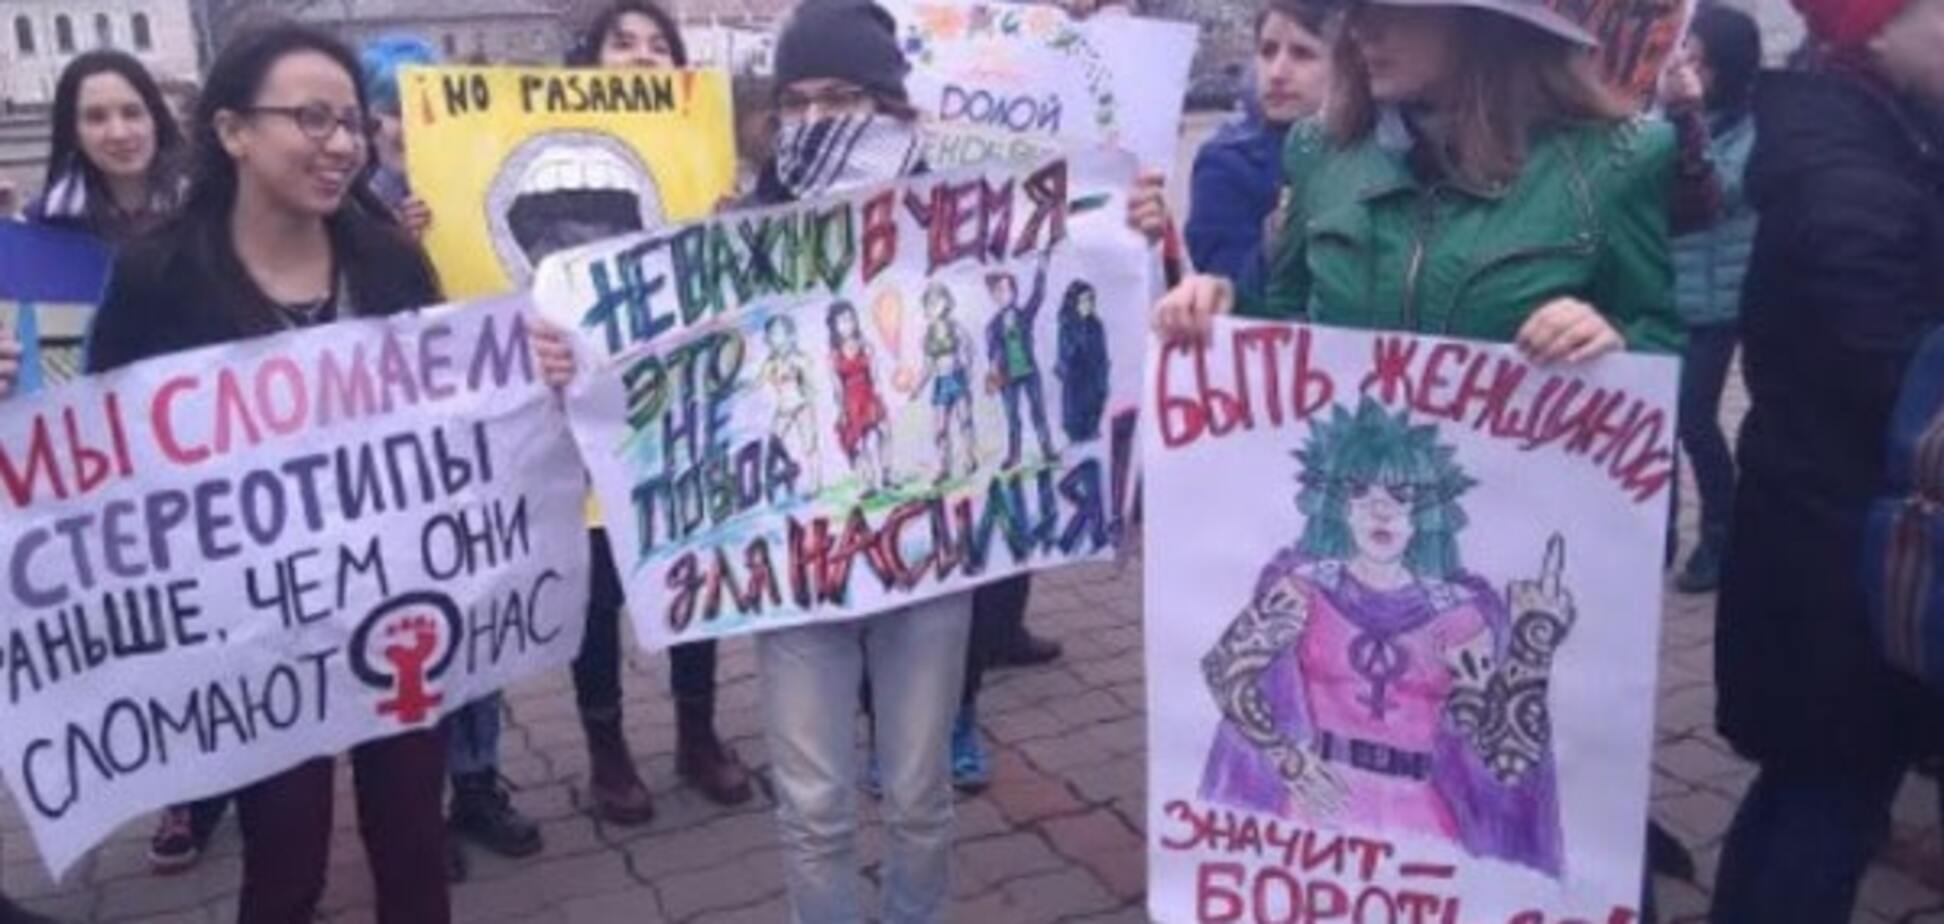 Даєш патріархат: у Харкові на мітинг жінок напали 'клоуни'